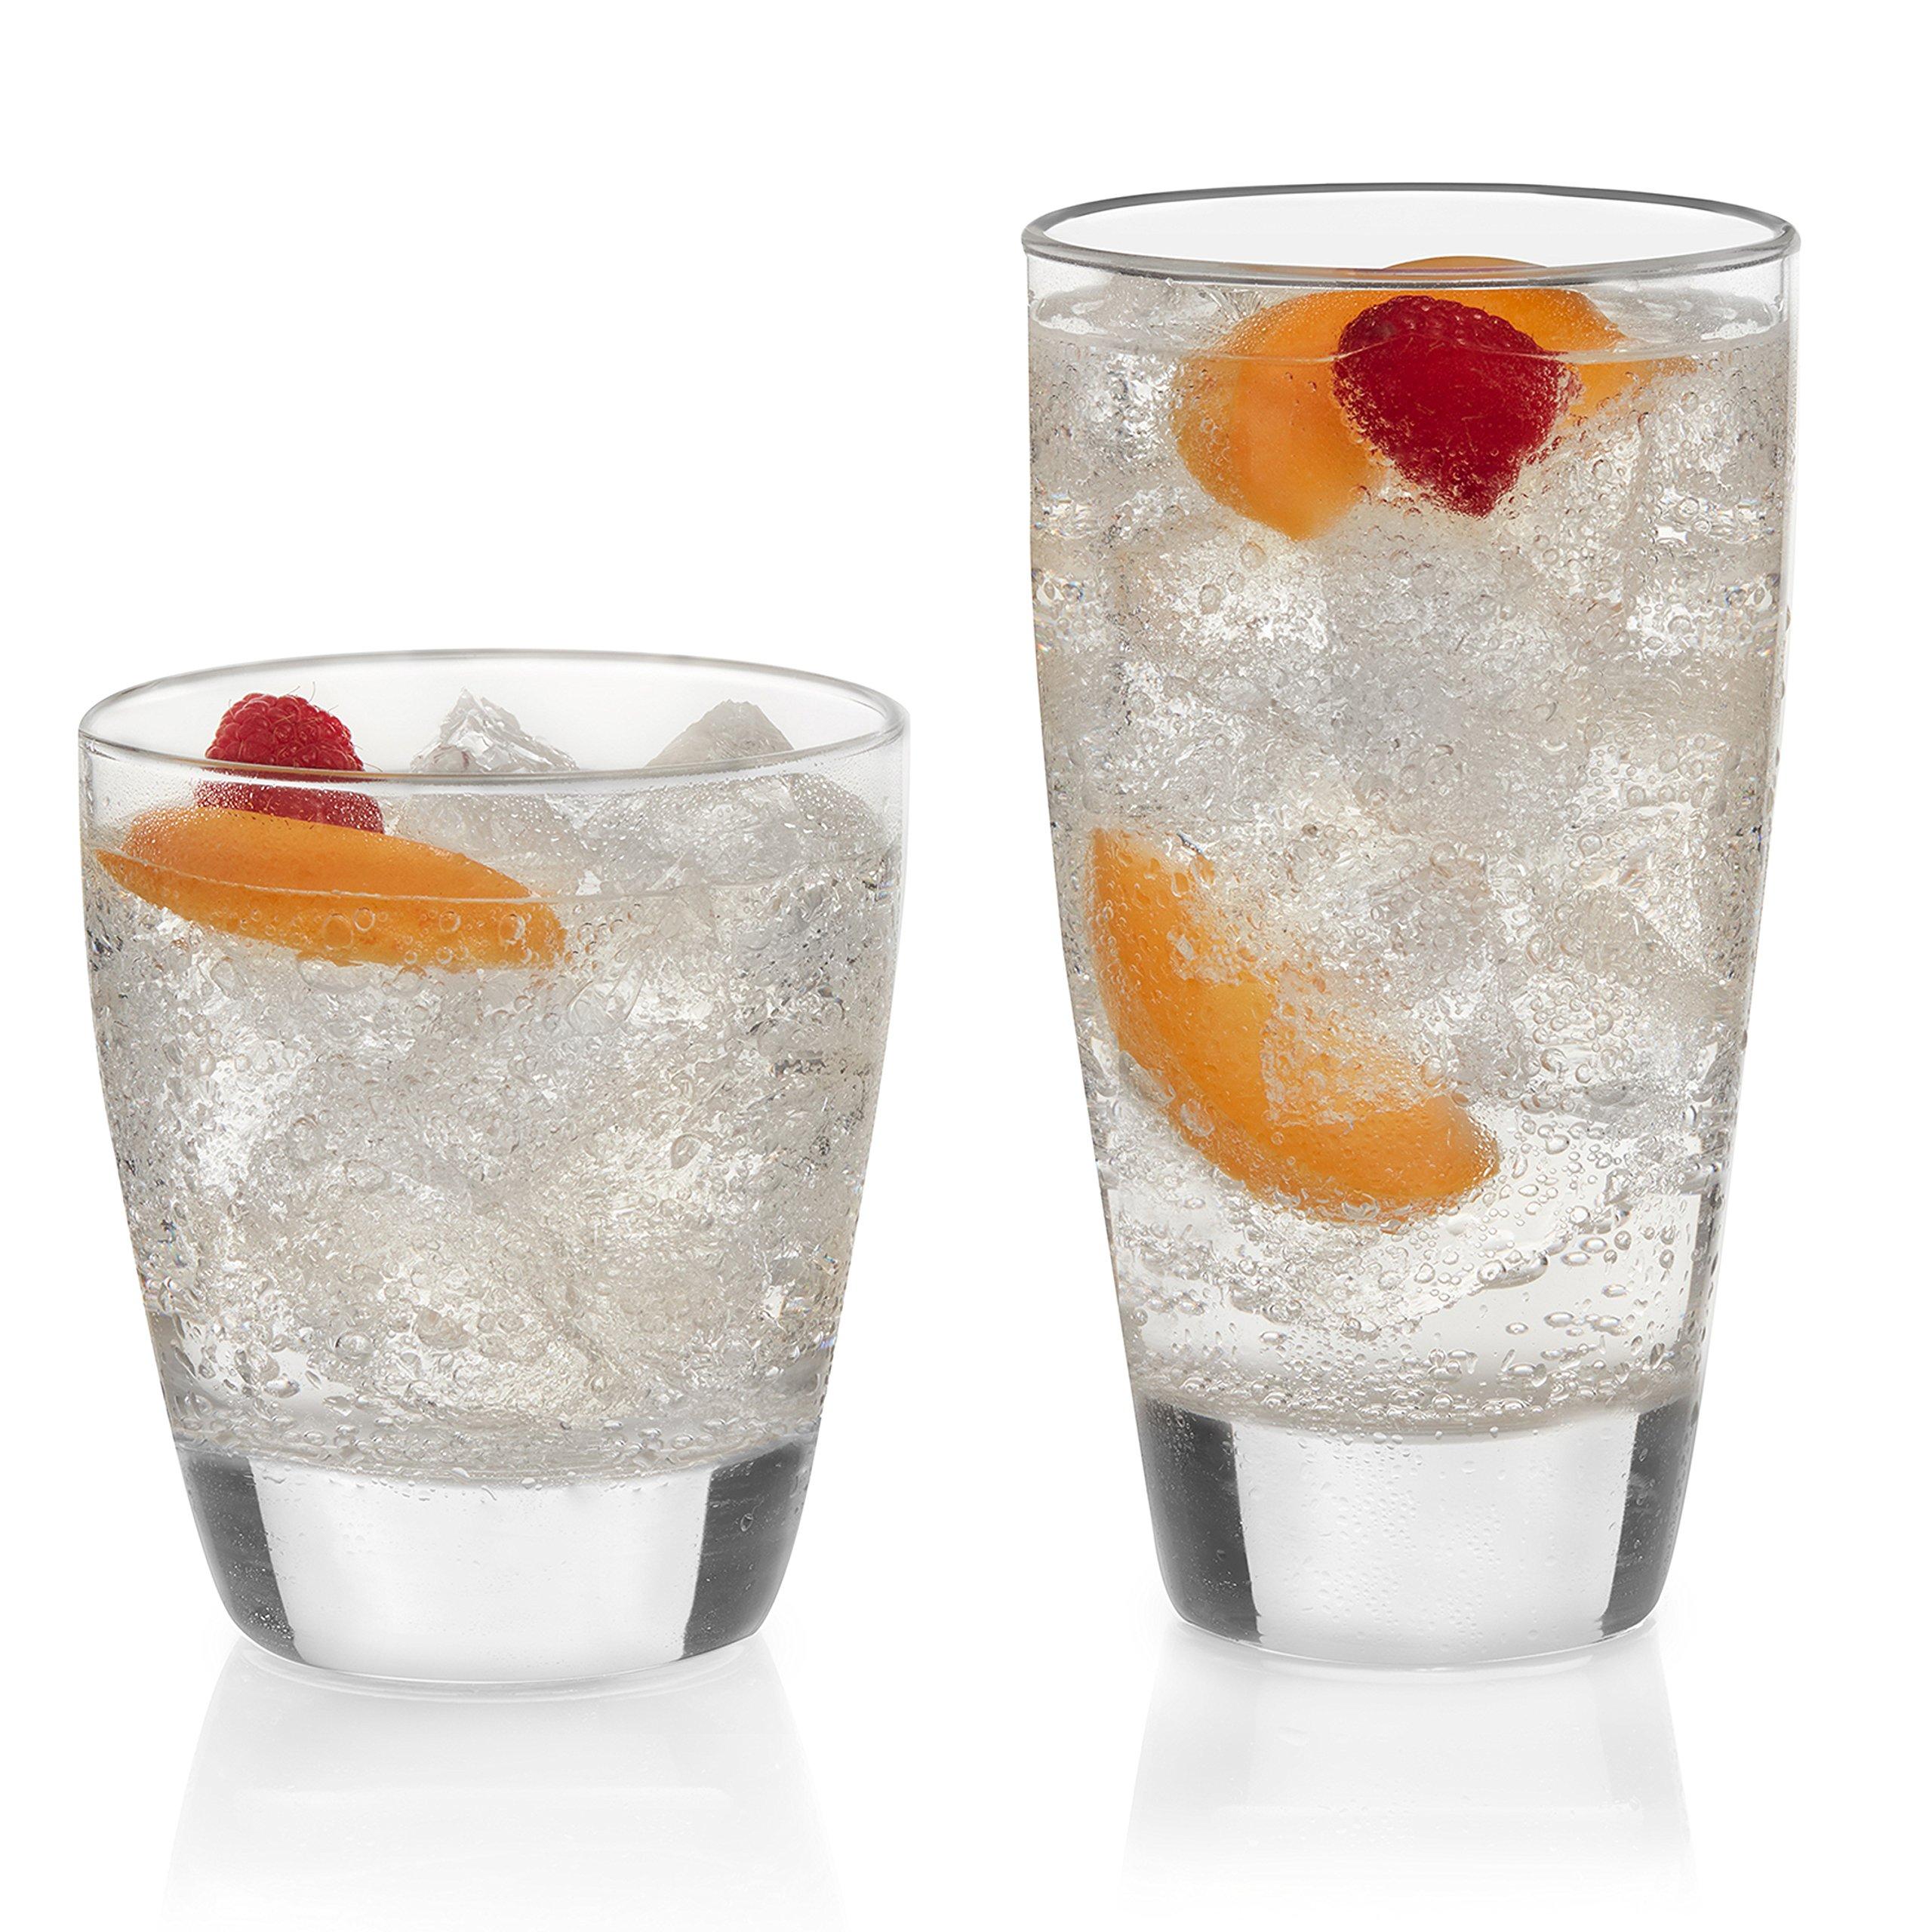 Libbey Classic 16-piece Drinkware Glass Set